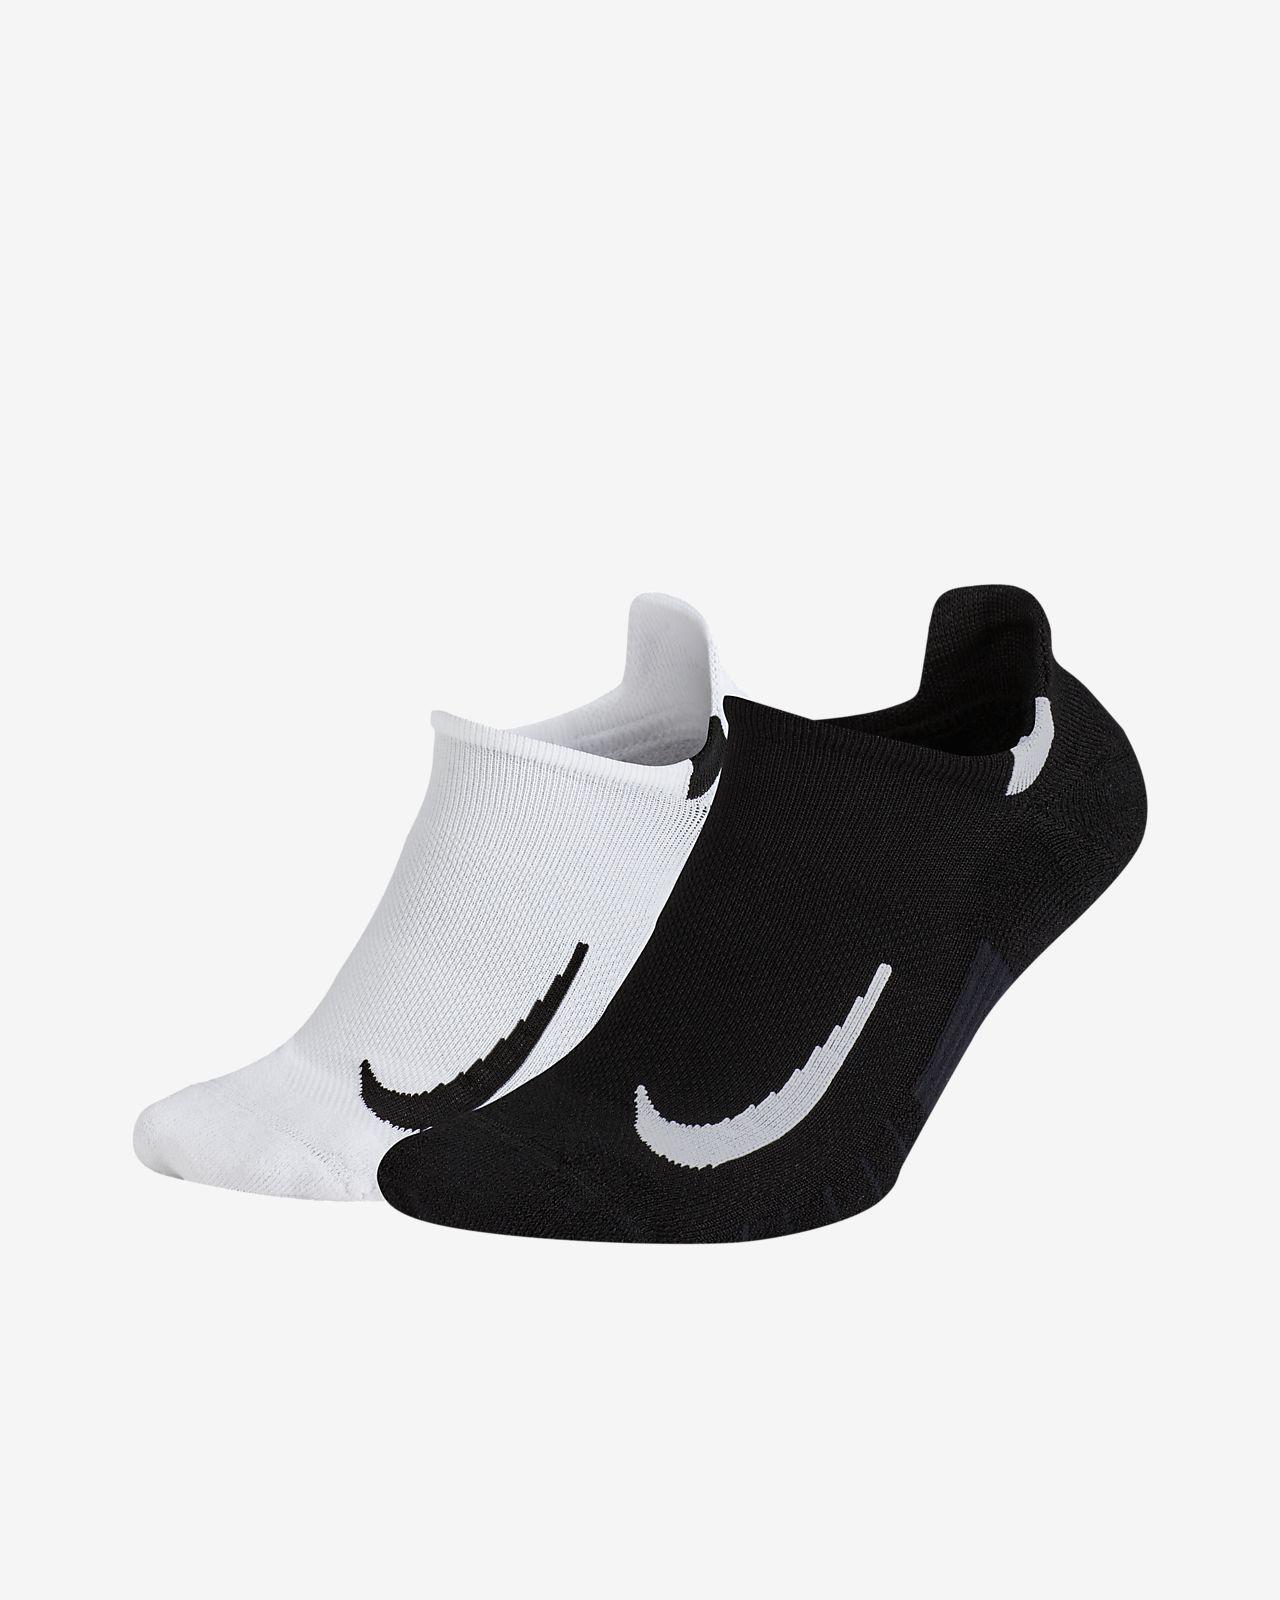 Nike Multiplier No-Show Socks (2 Pair)